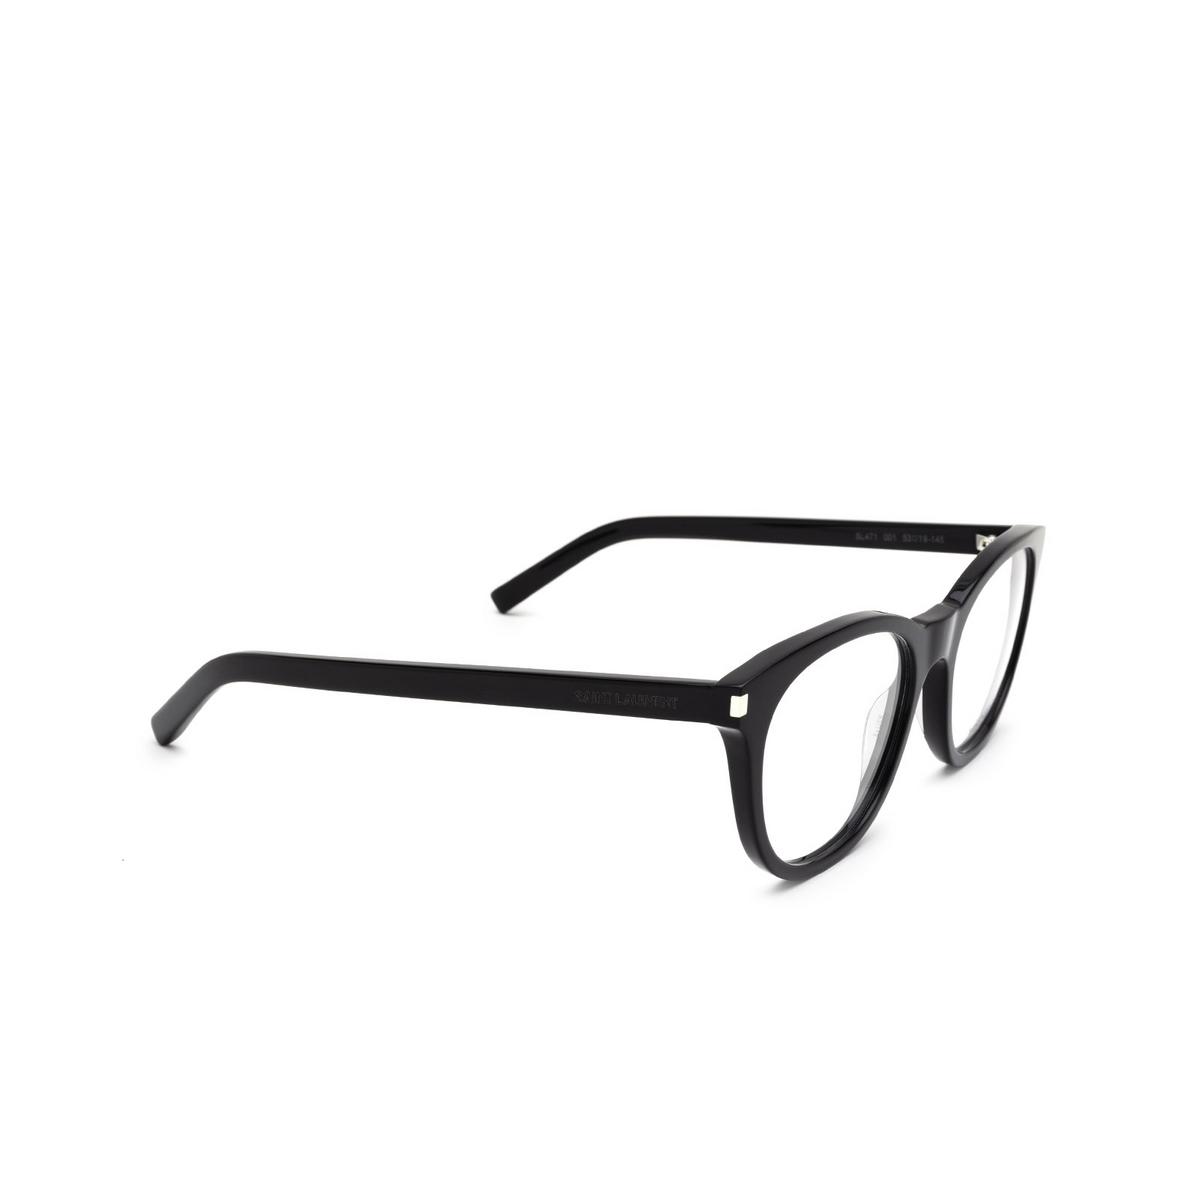 Saint Laurent® Square Eyeglasses: SL 471 color Black 001 - three-quarters view.